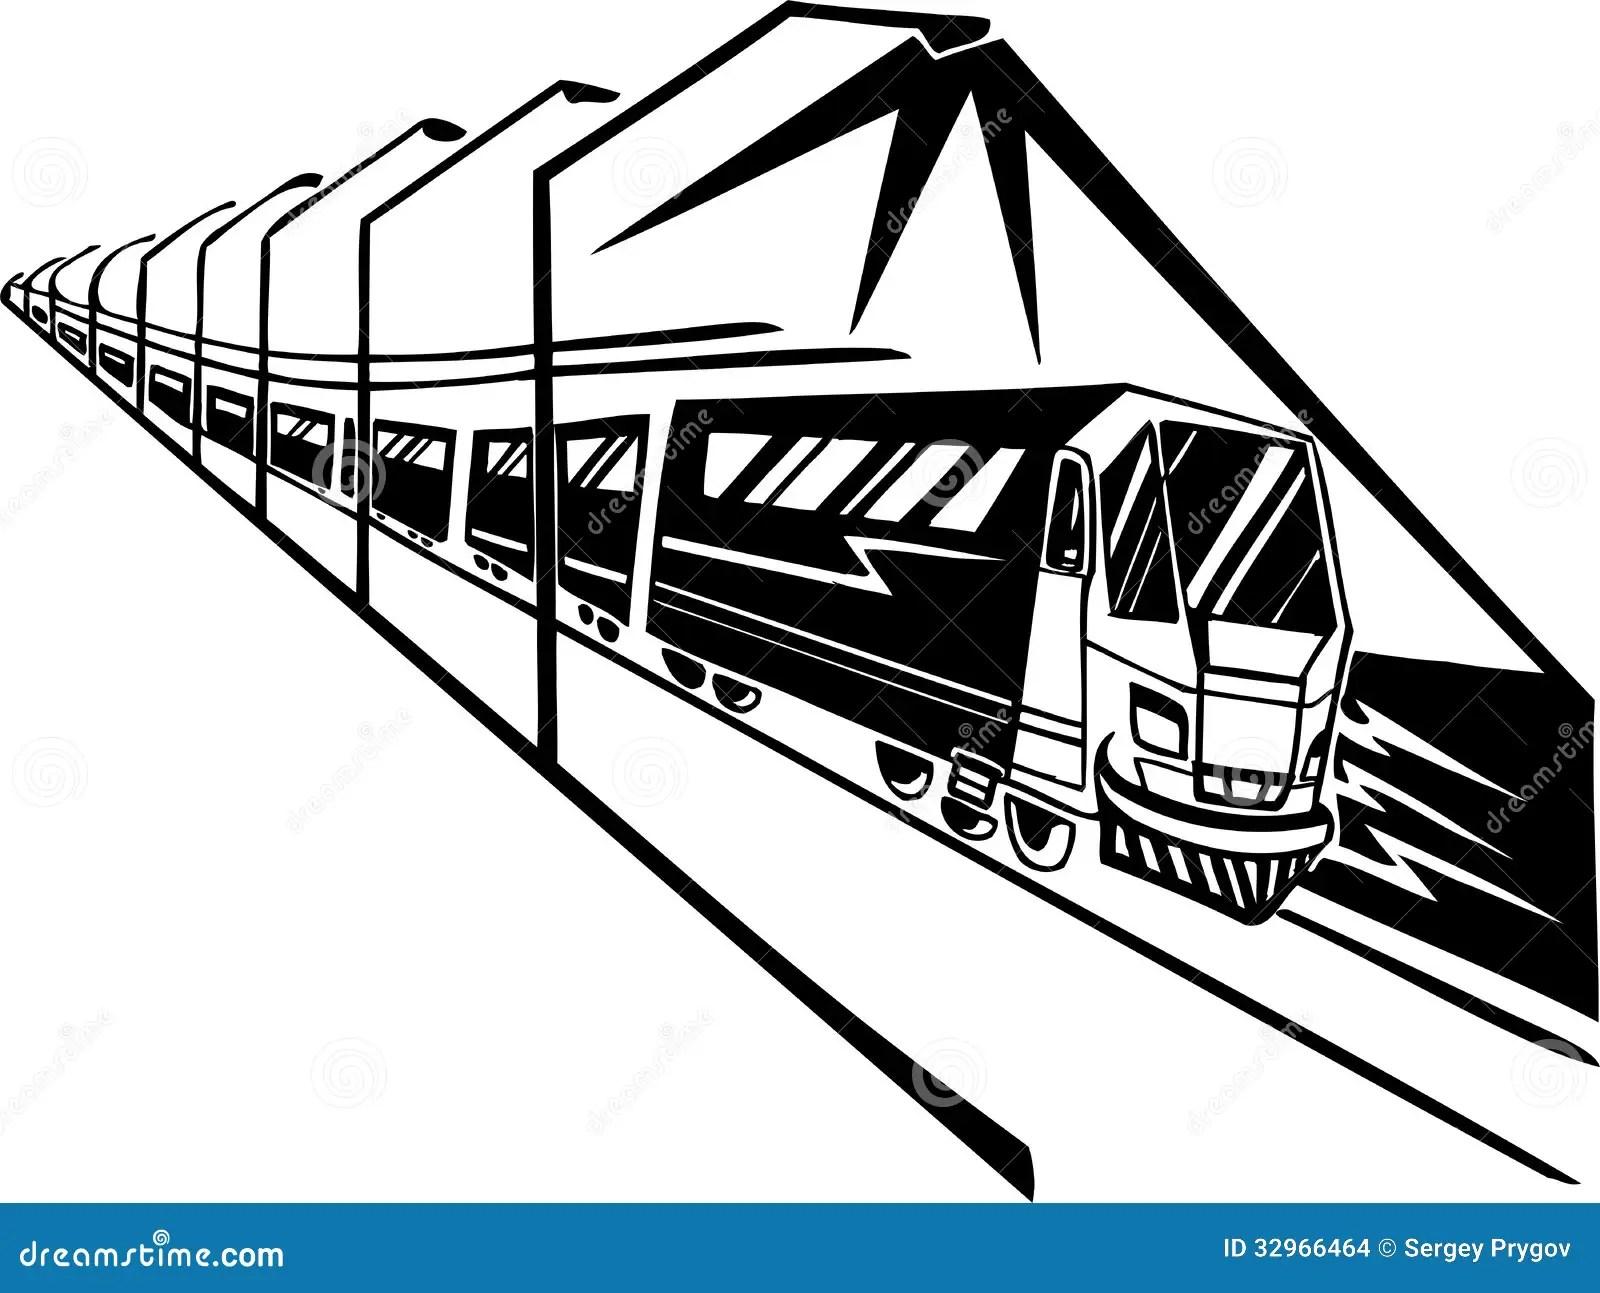 Train On Station Vector Illustration Stock Vector